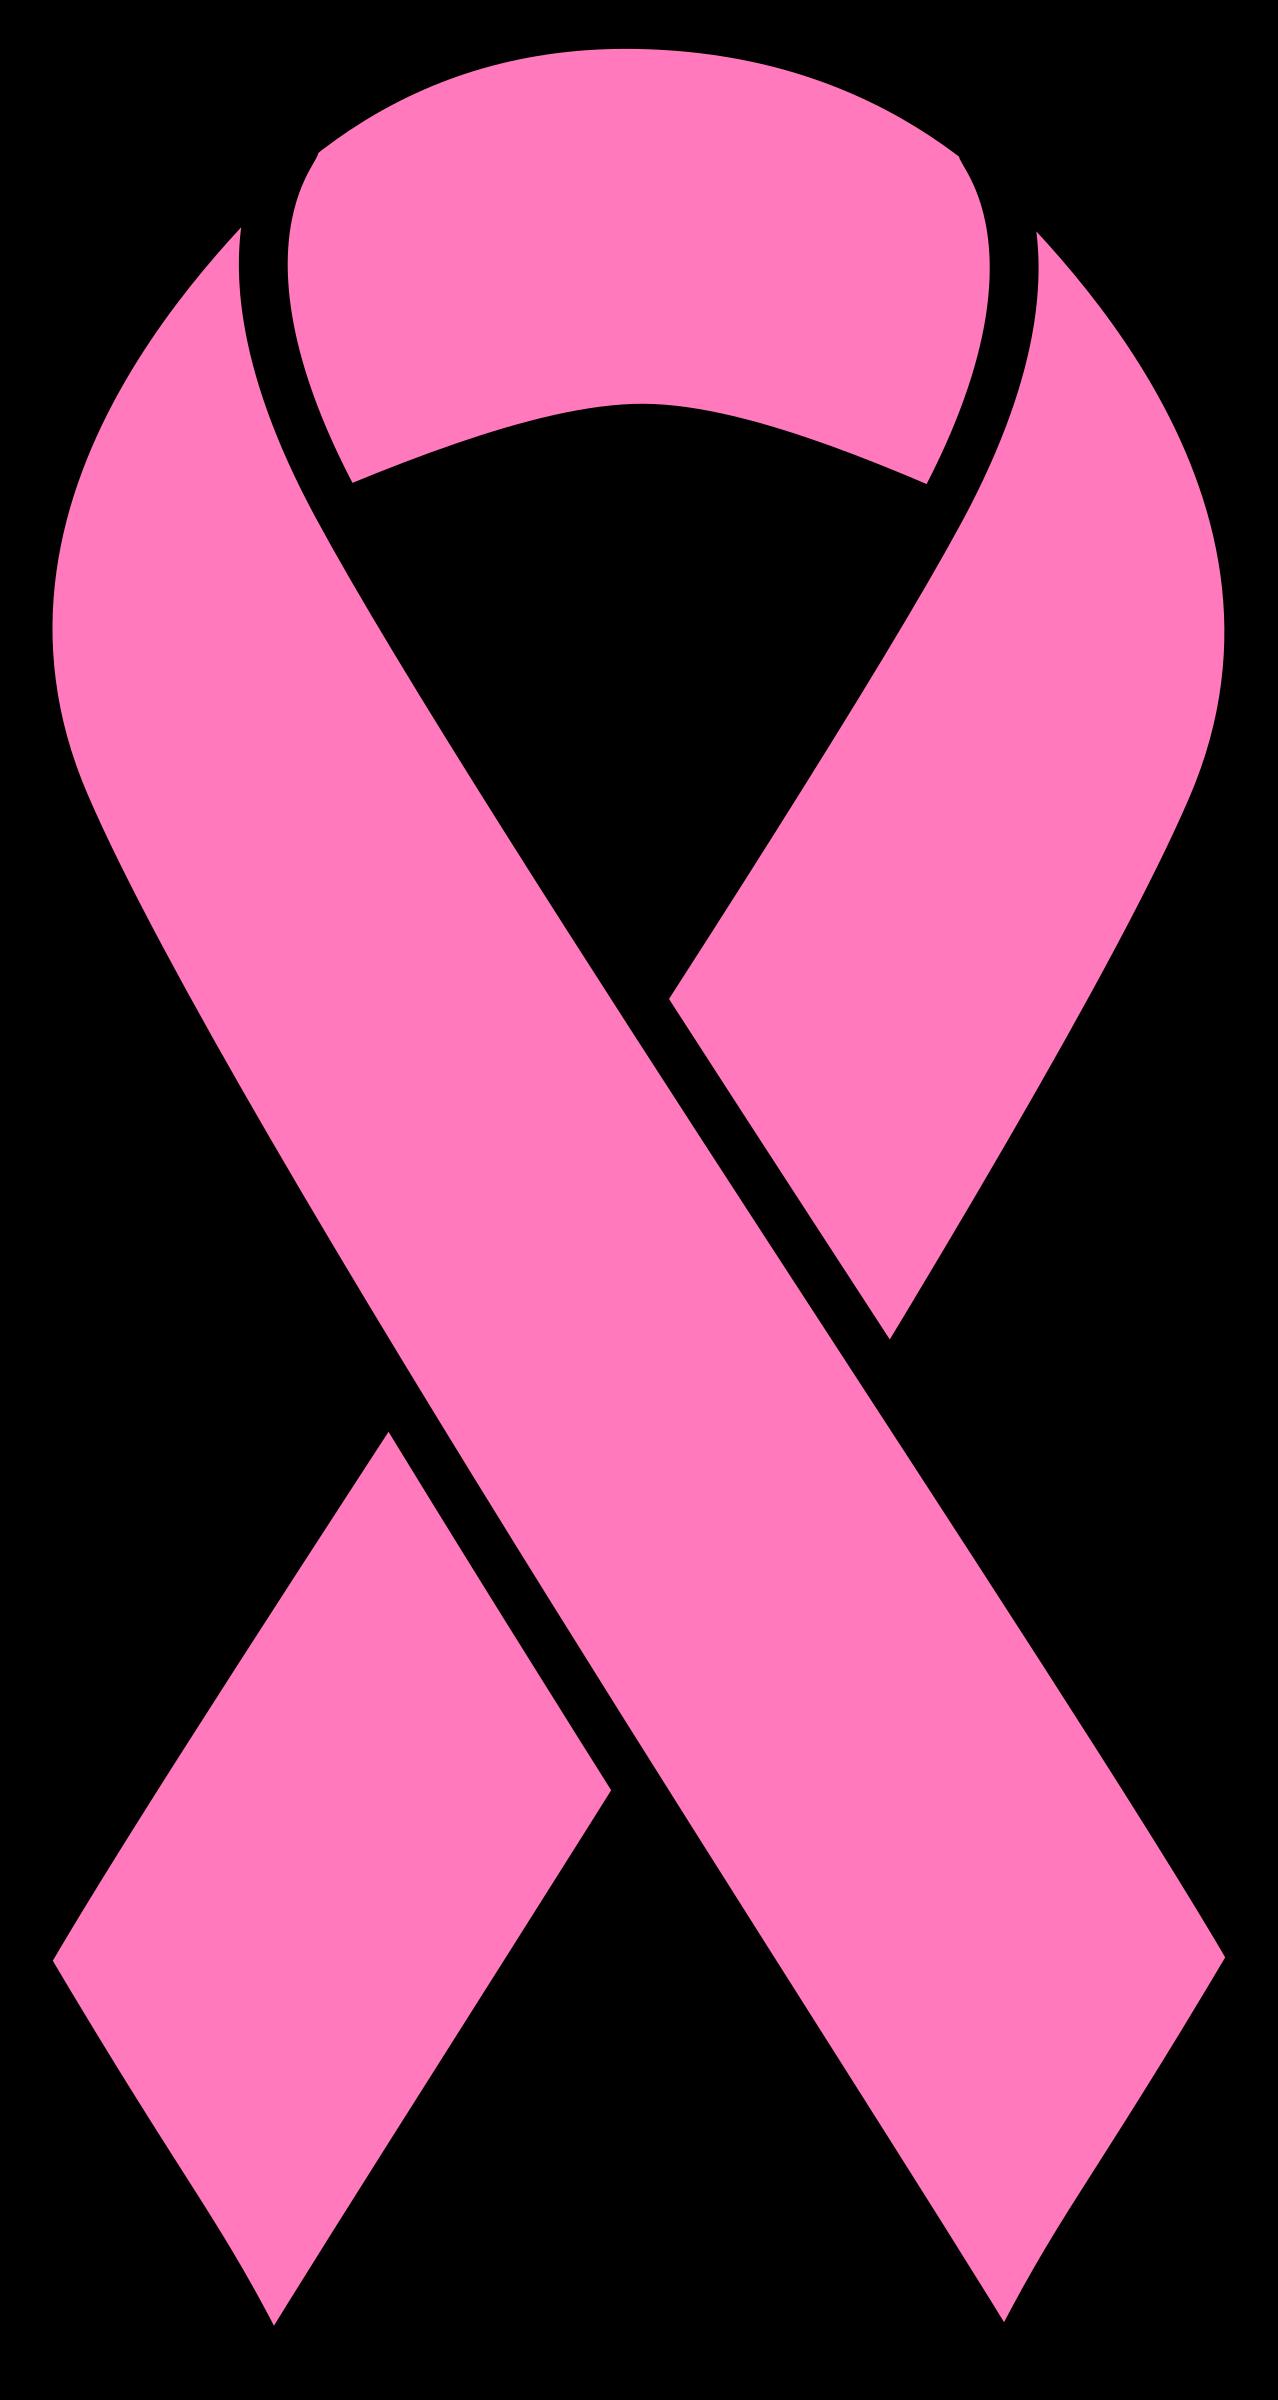 ... Printable breast cancer ribbon clipart 2 clipartall - Cliparting clipartall.com ...